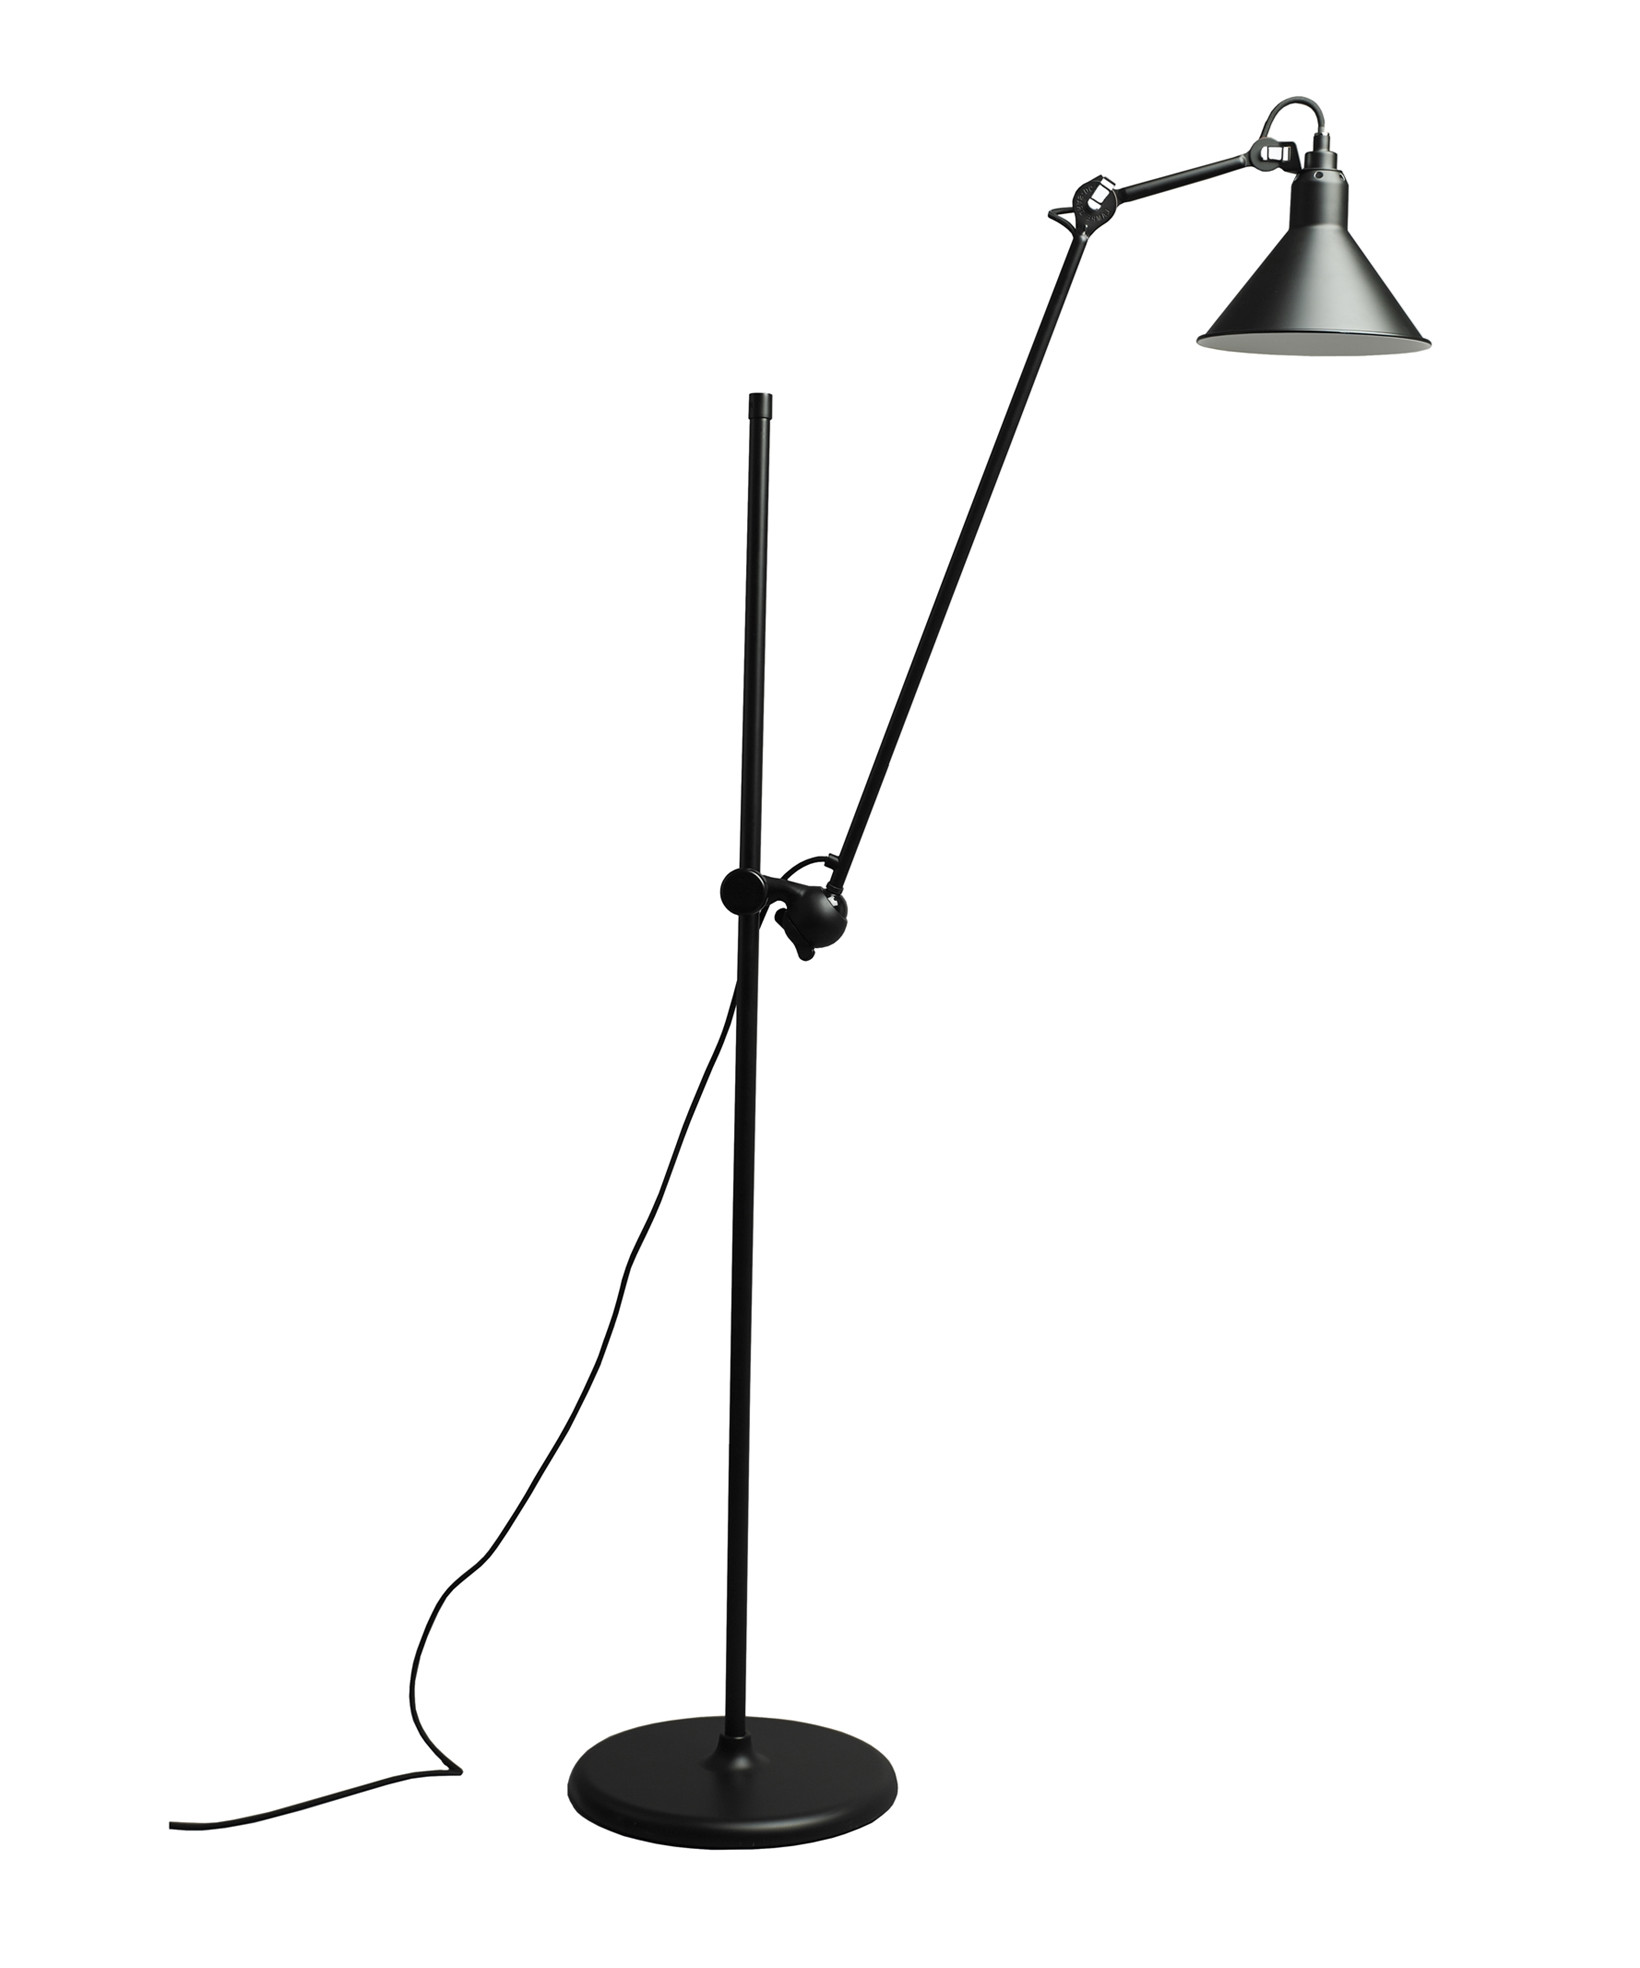 215 stehleuchte schwarz lampe gras. Black Bedroom Furniture Sets. Home Design Ideas